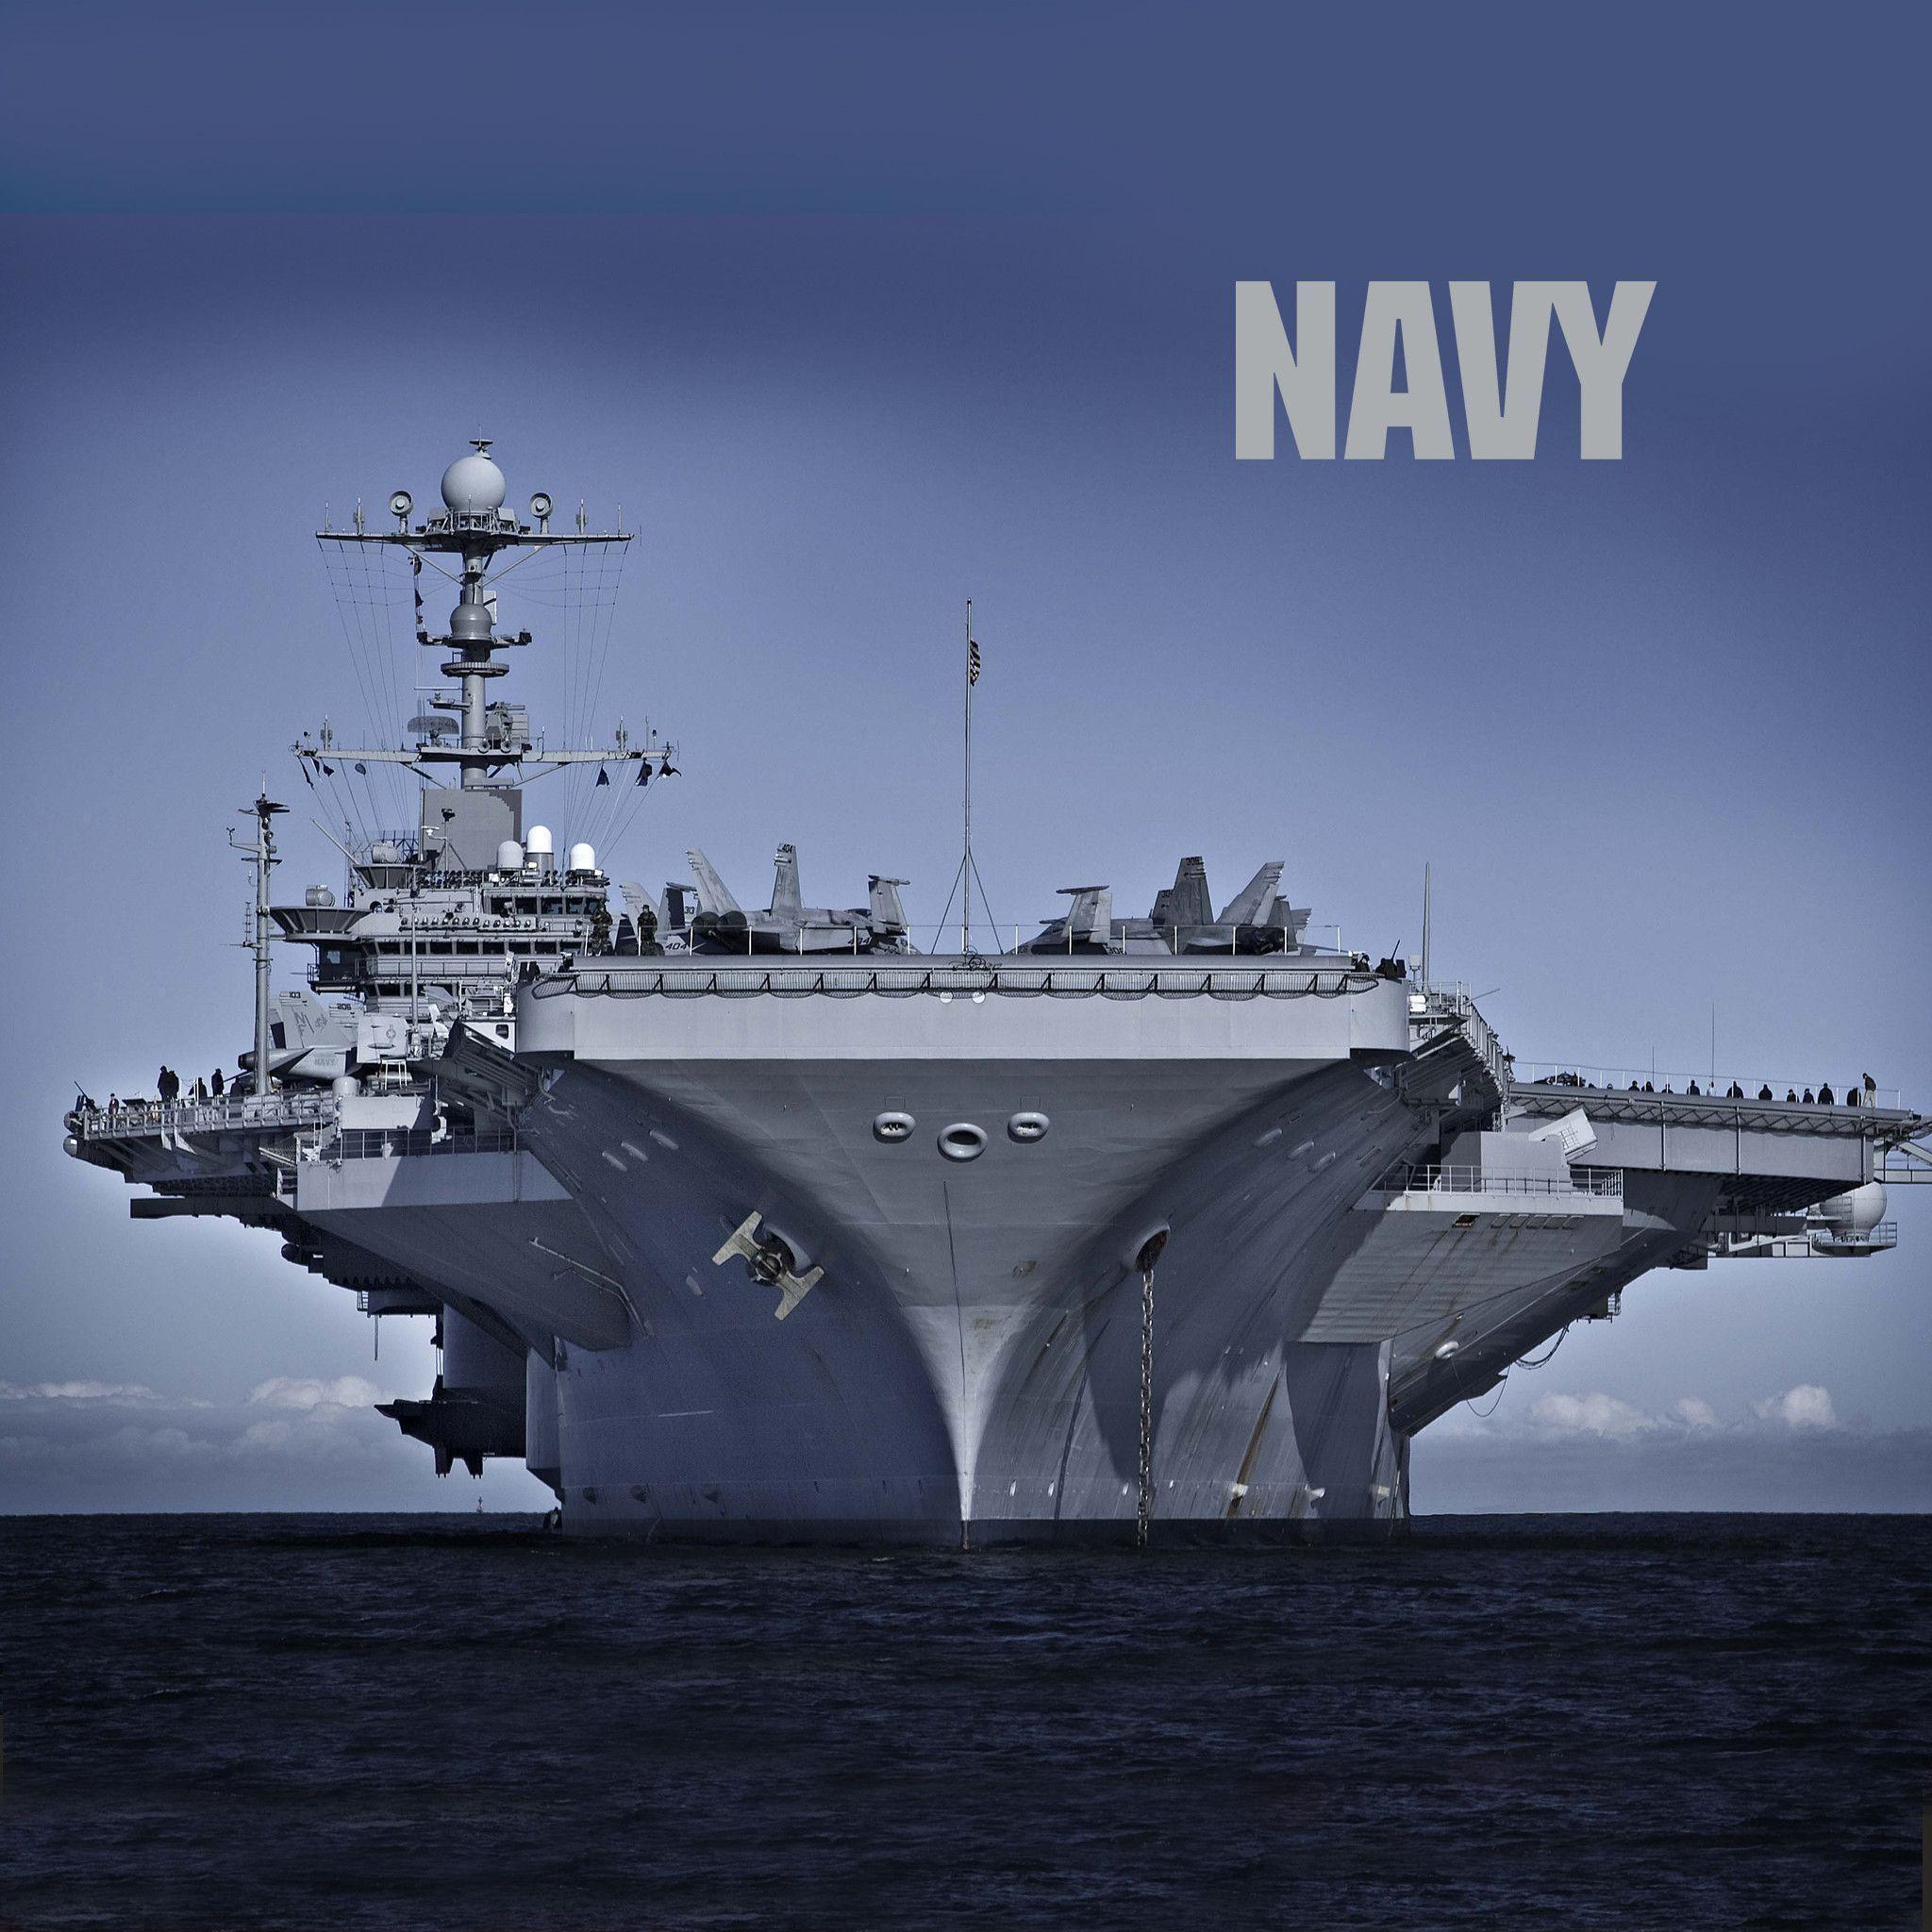 US Navy | Sky HD Wallpaper